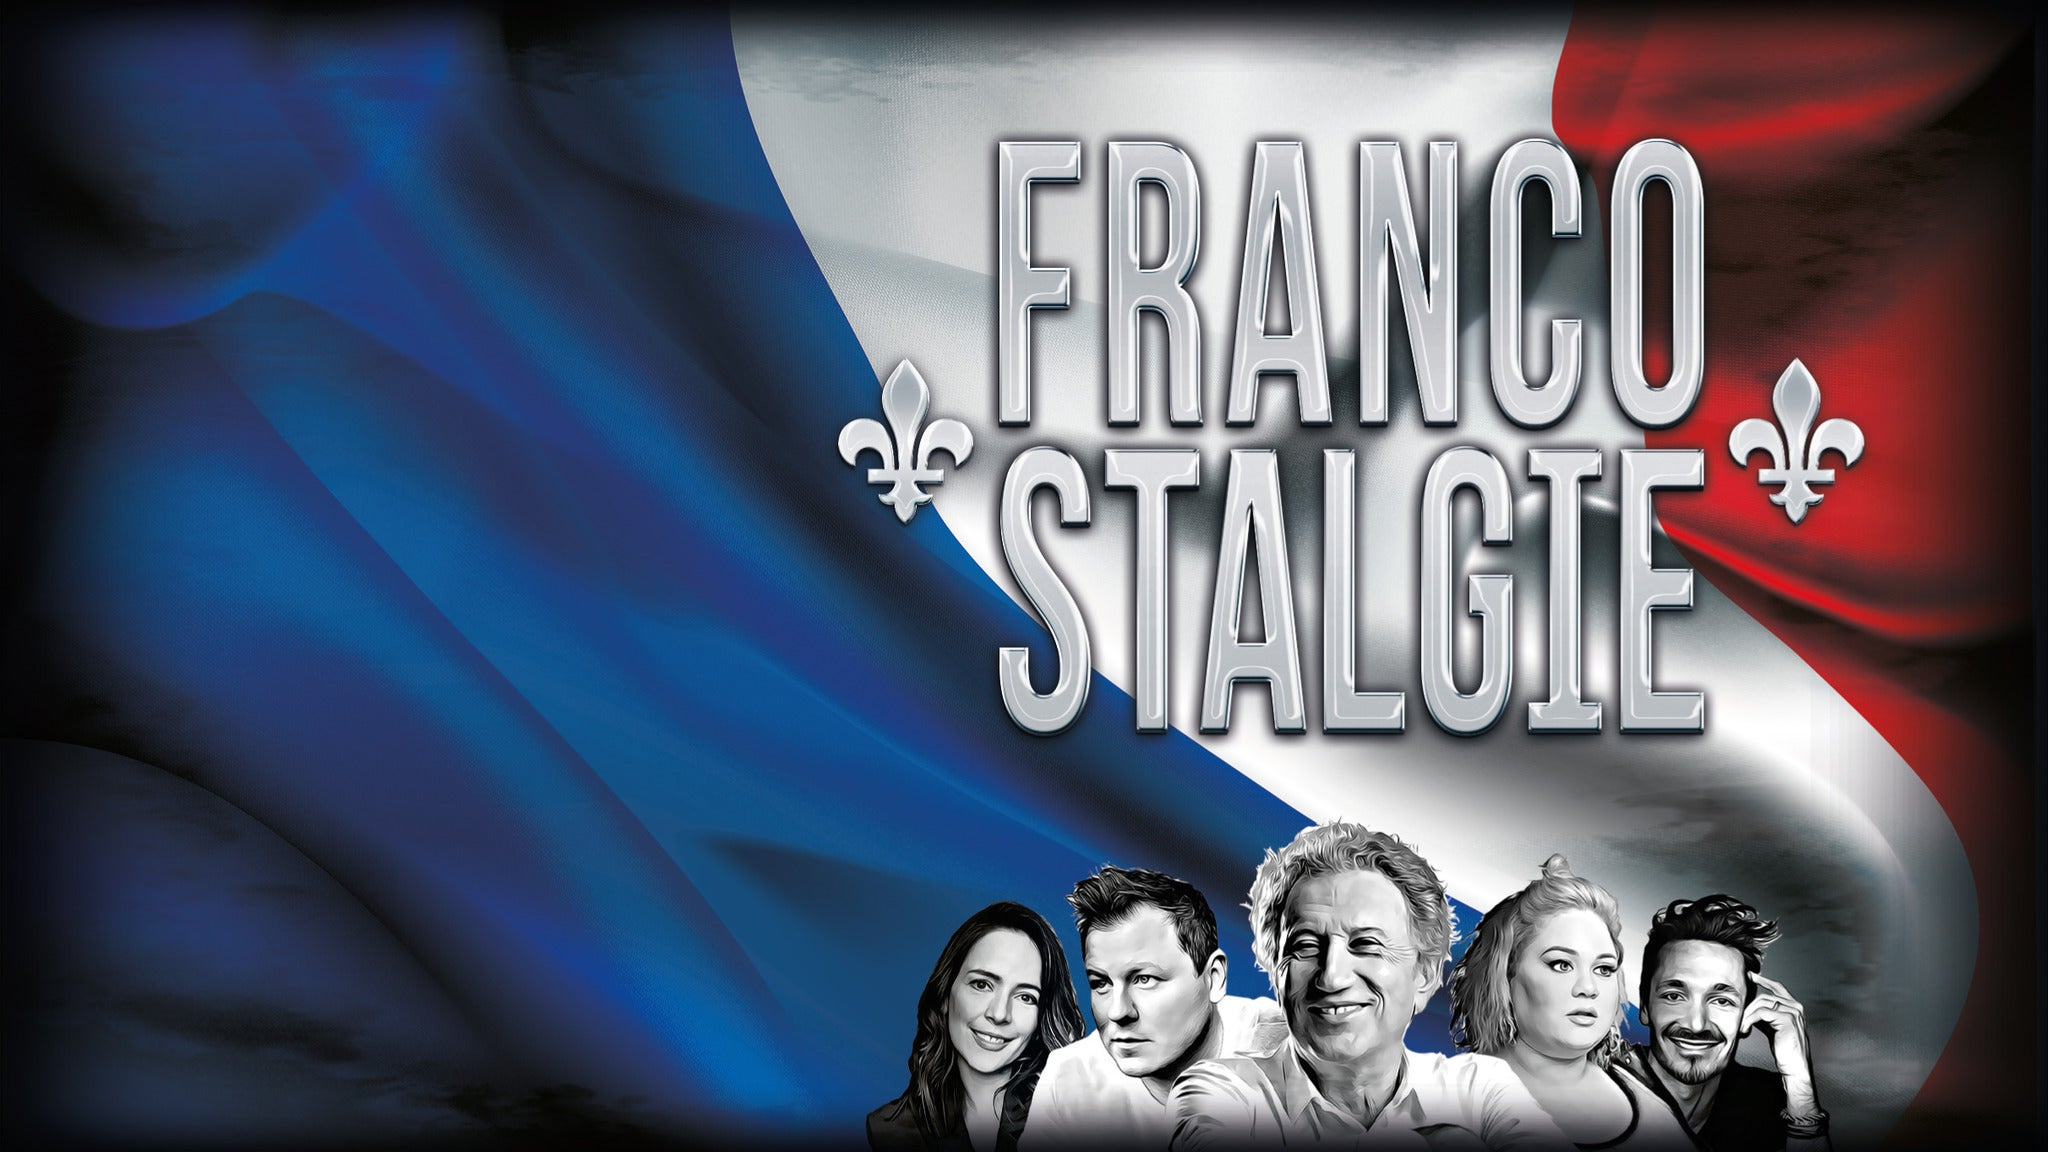 Francostalgie - La Grande Revue Musicale tickets (Copyright © Ticketmaster)